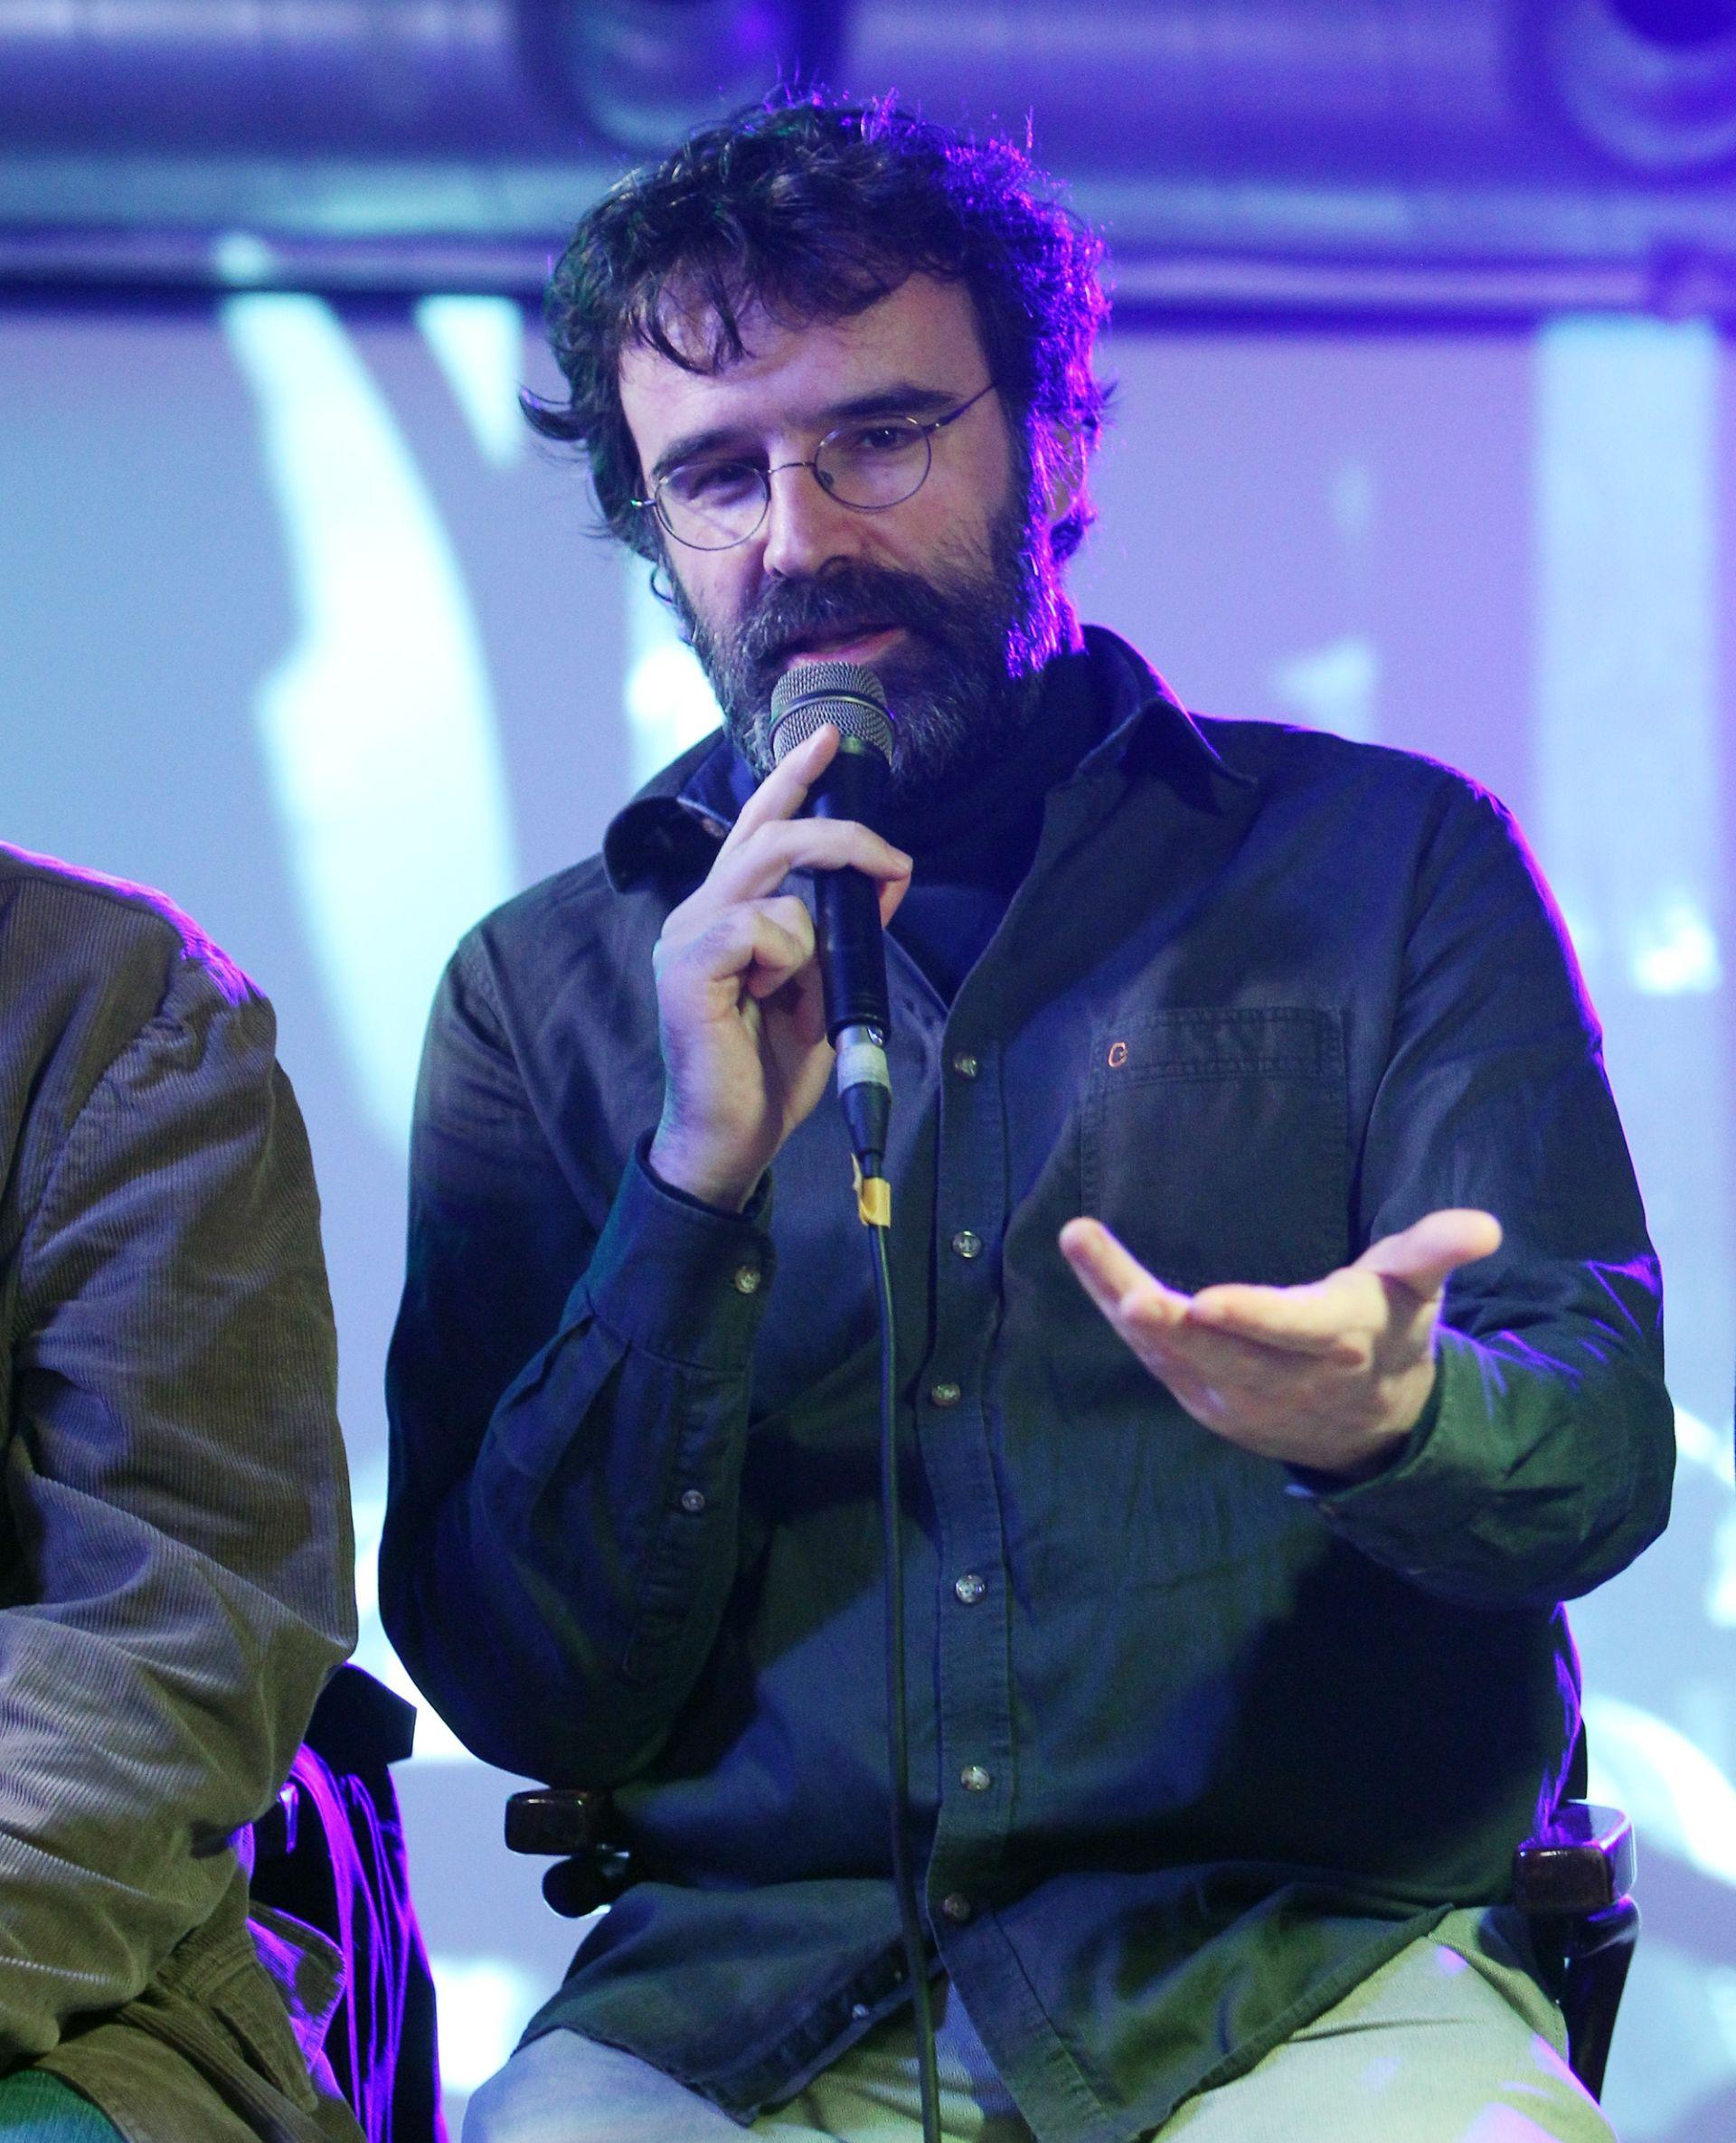 Umro glazbenik i rock kritičar Ante Perković